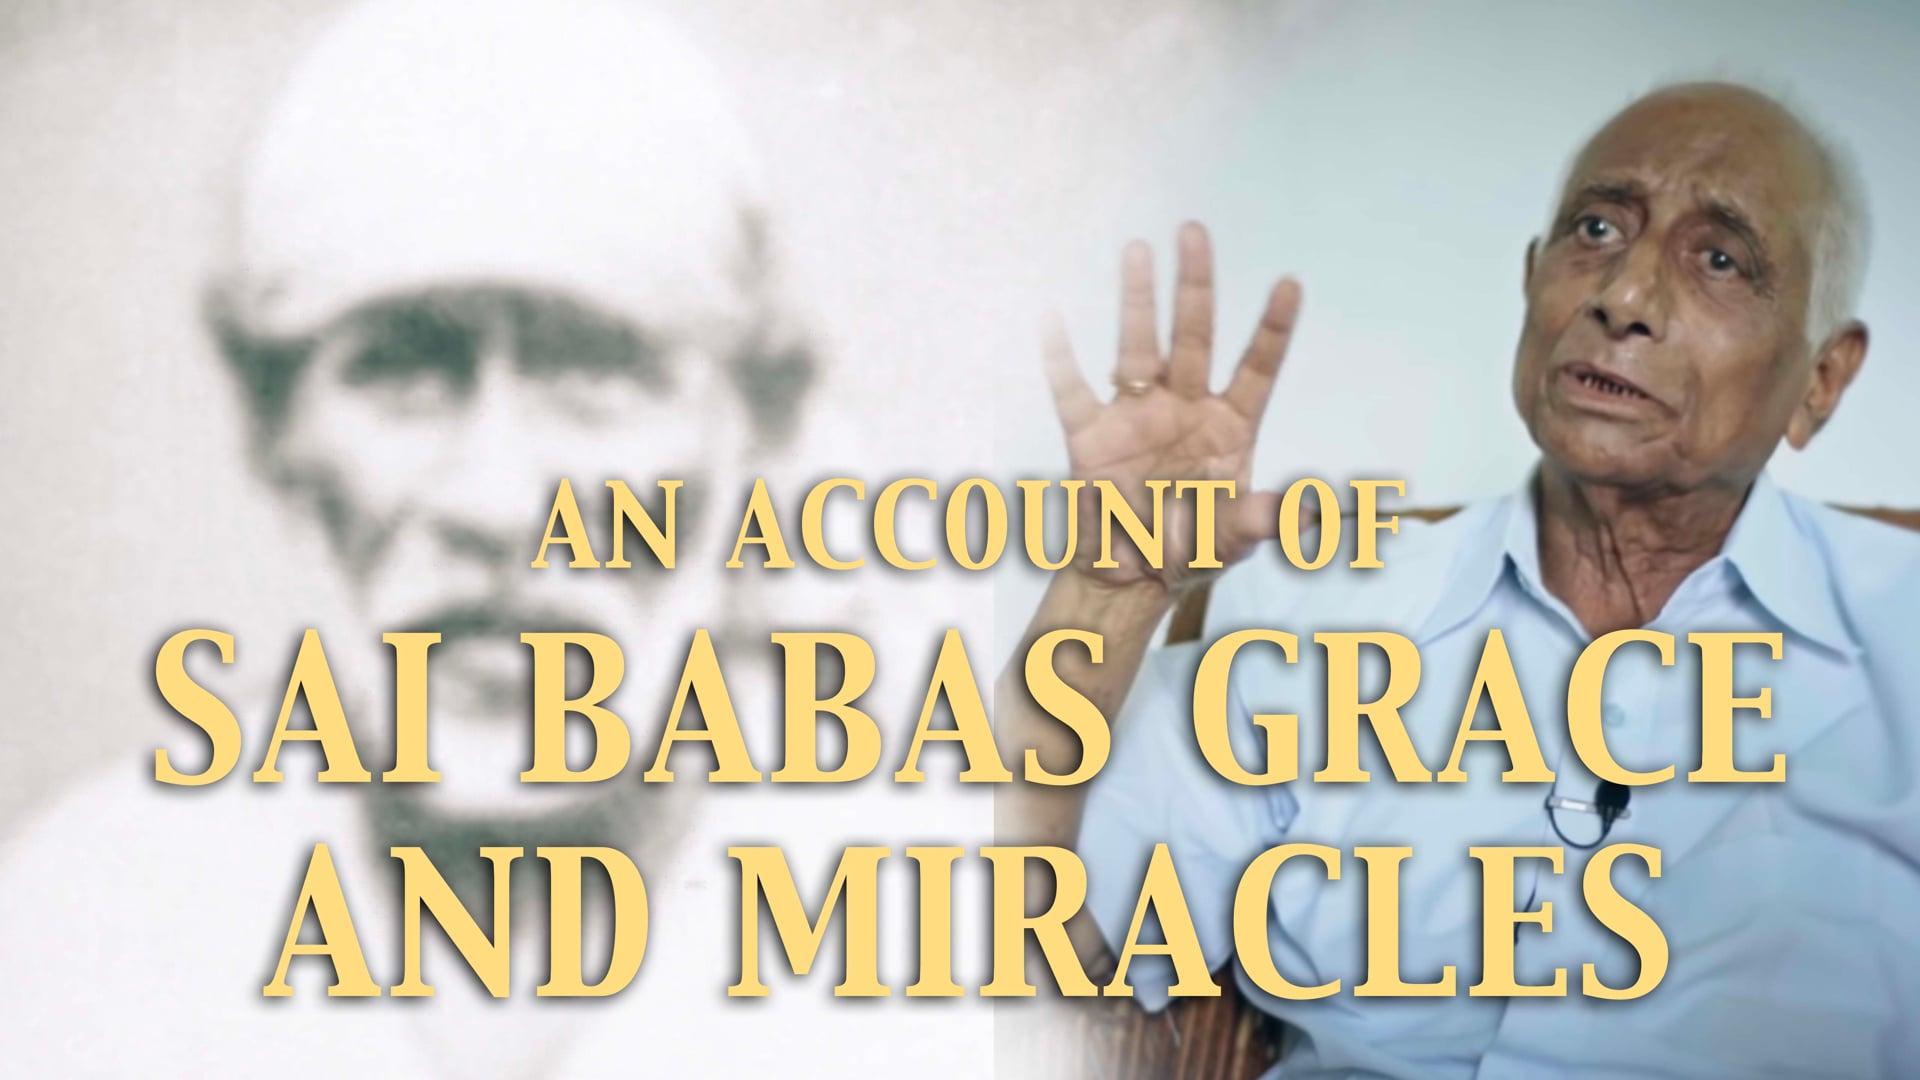 Masterji on Sai Baba's miracles and his life with Aai